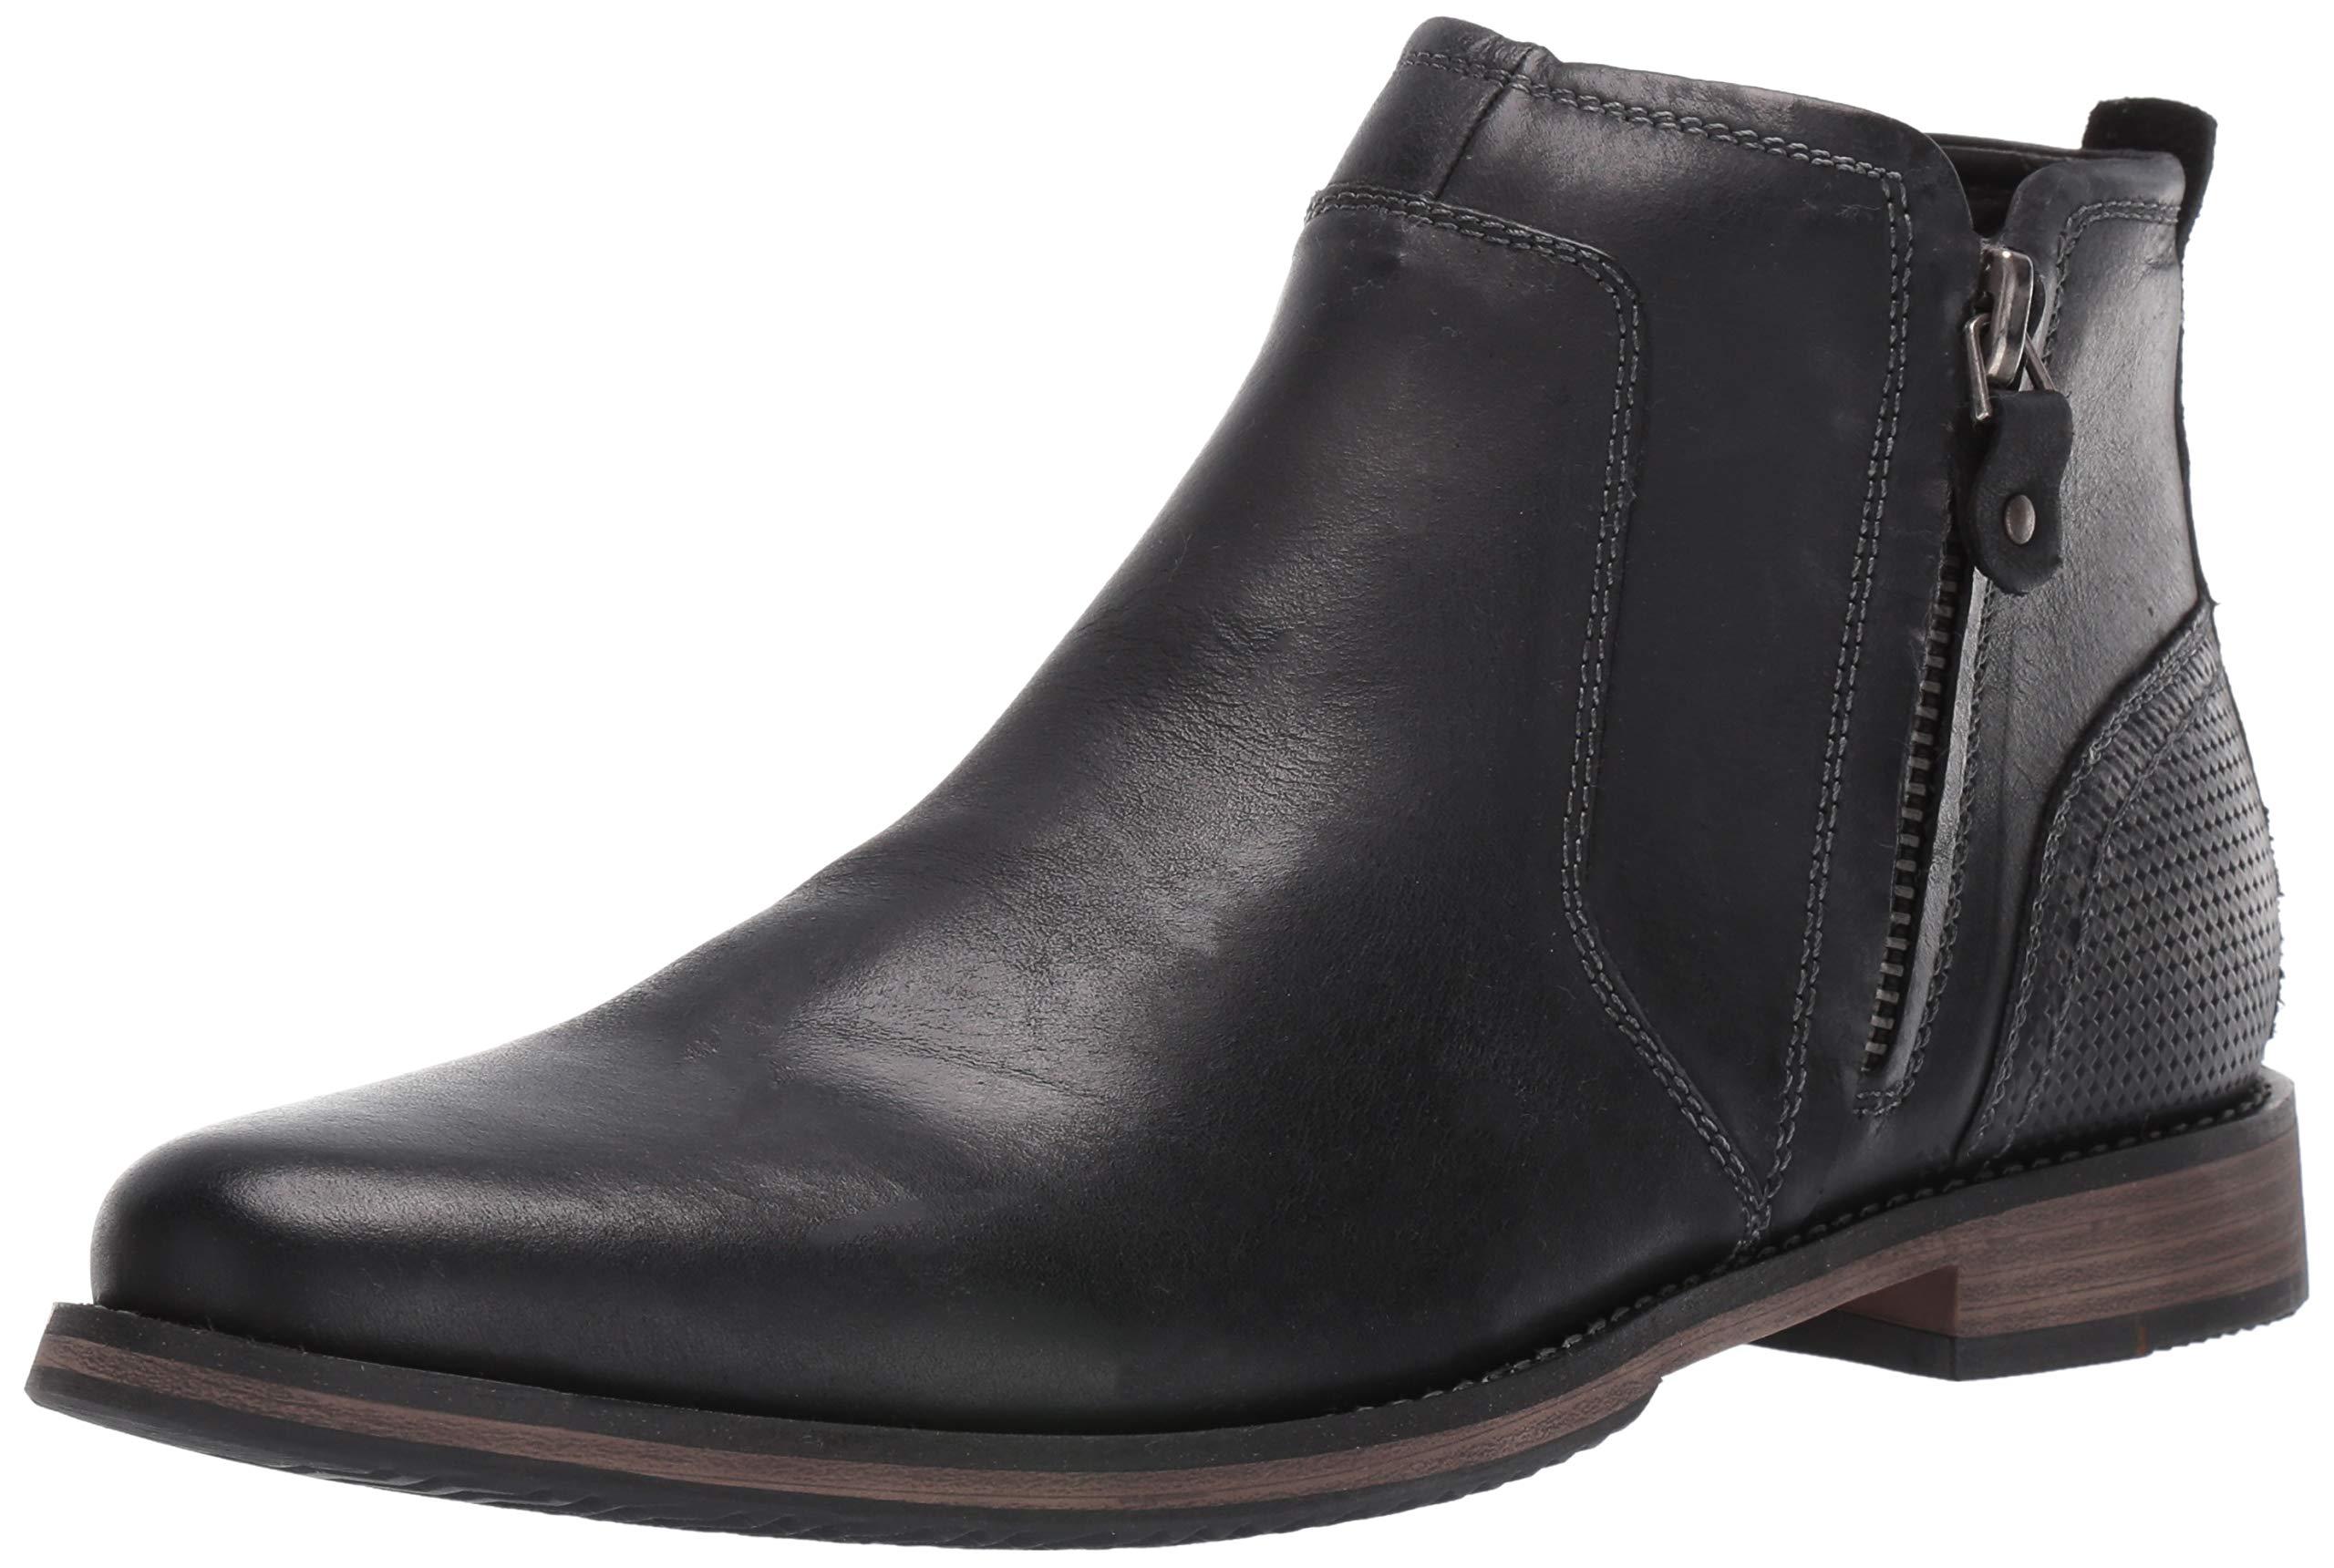 Steve Madden Men's Palma Boot, Black Leather, 12 M US